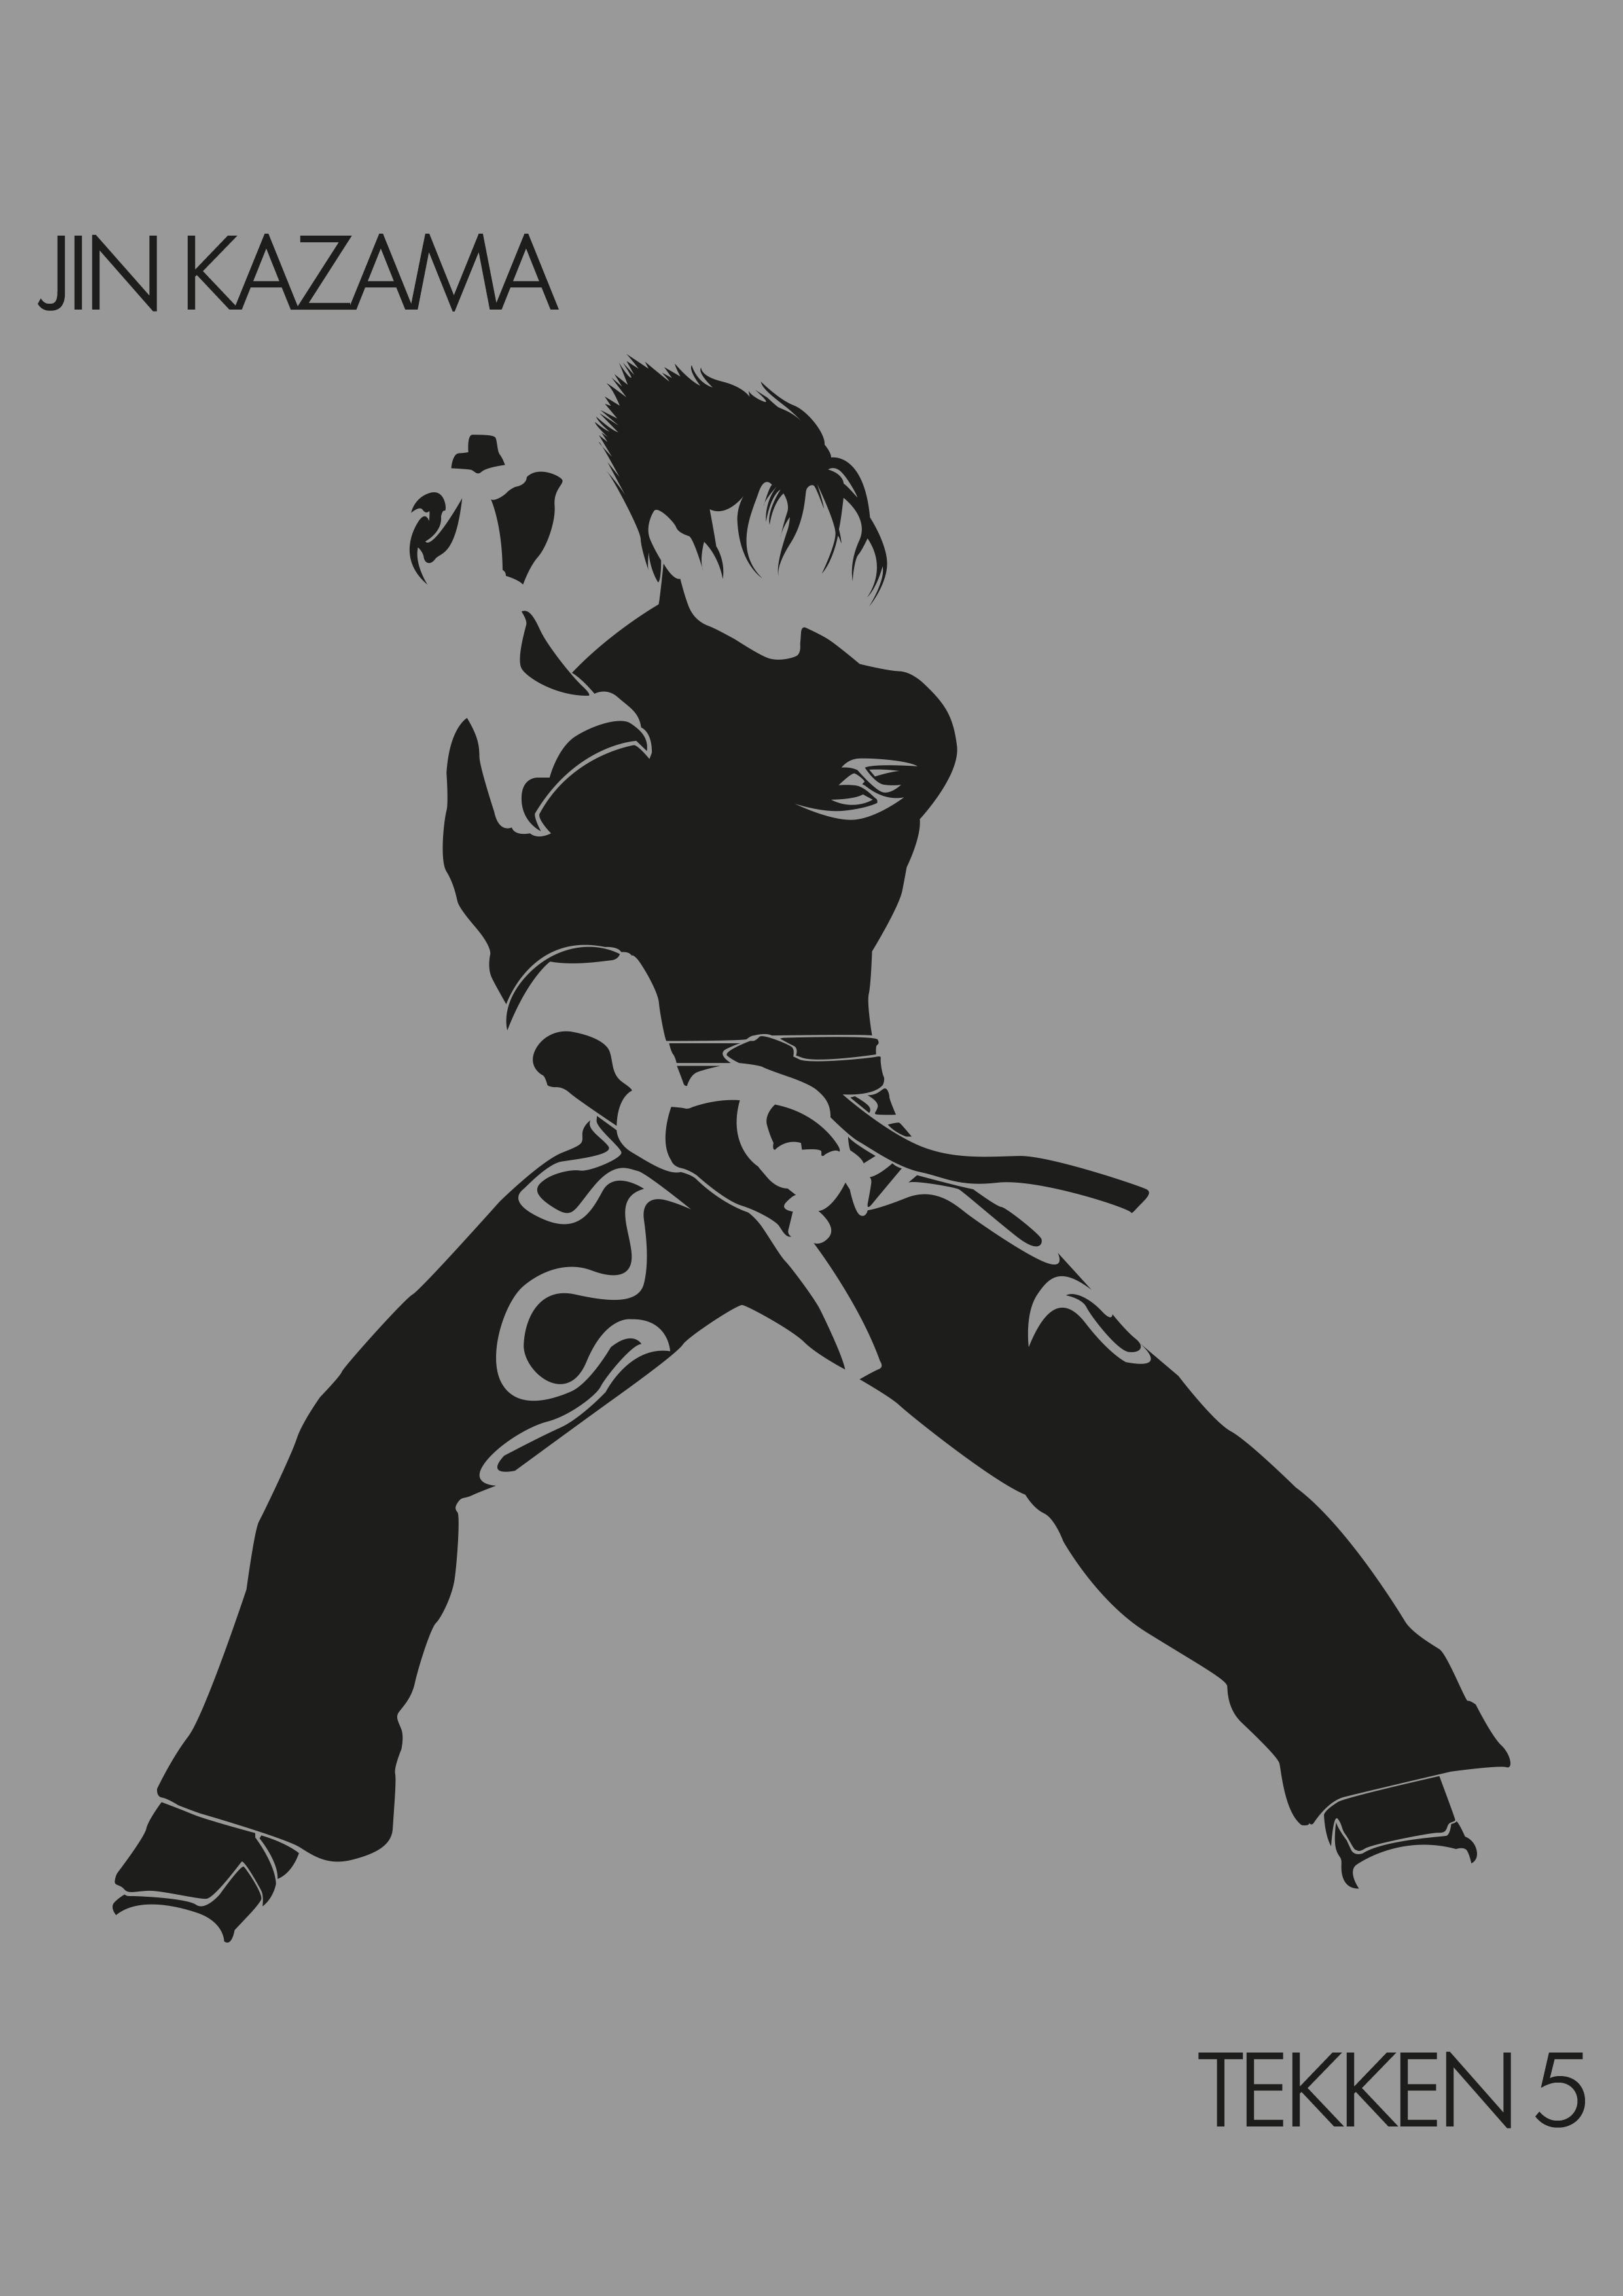 Jin Kazama Tekken 5 By Marco Desenhos Antigos Overwatch Desenhos